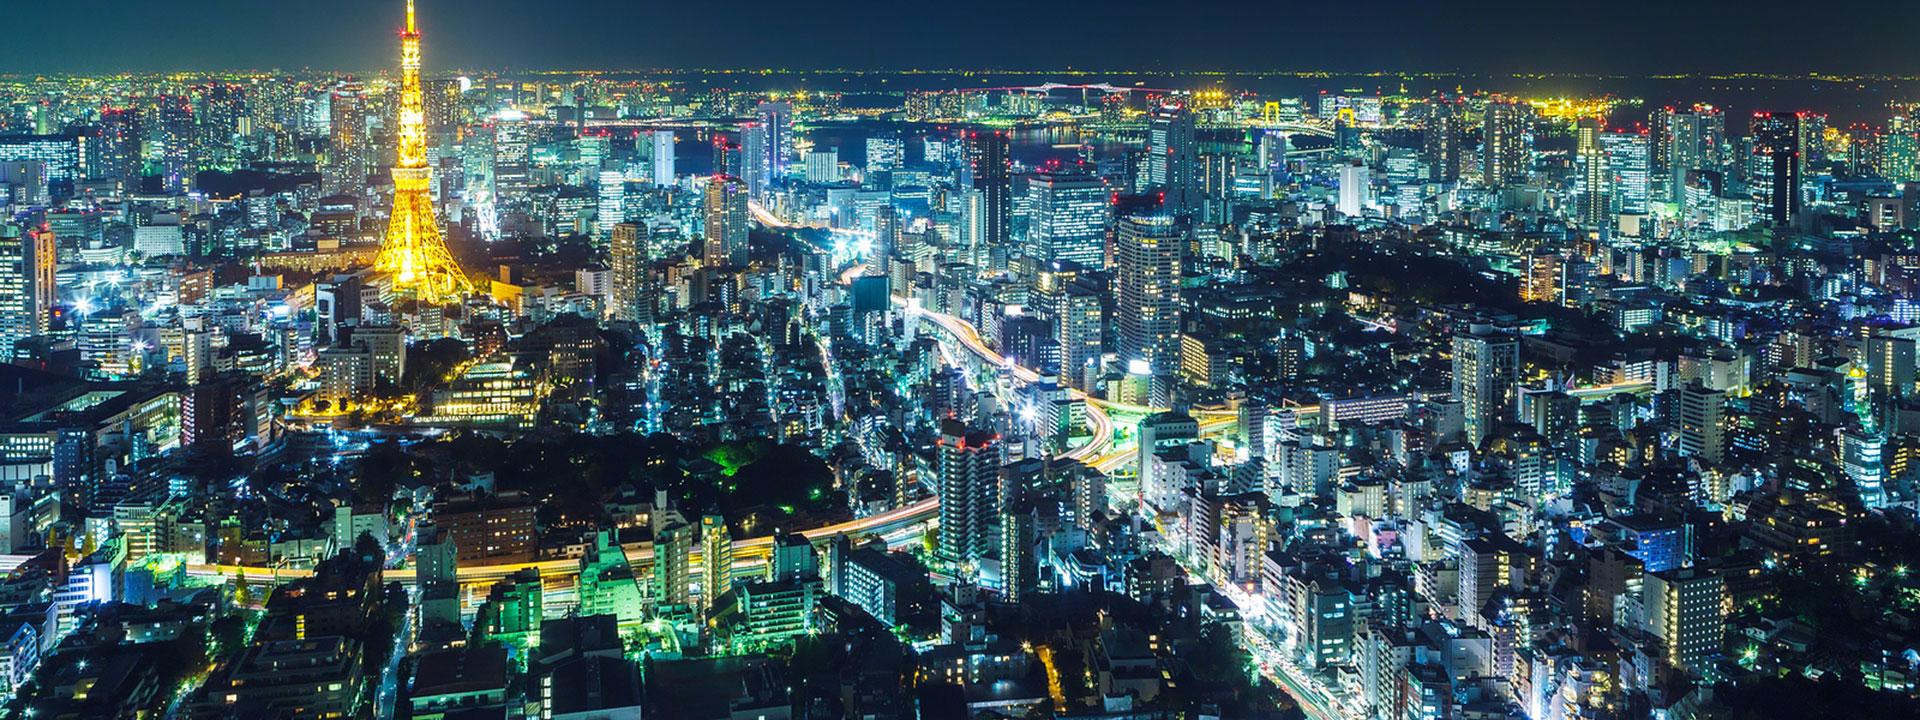 tokayo-night-time.jpg-without-mark